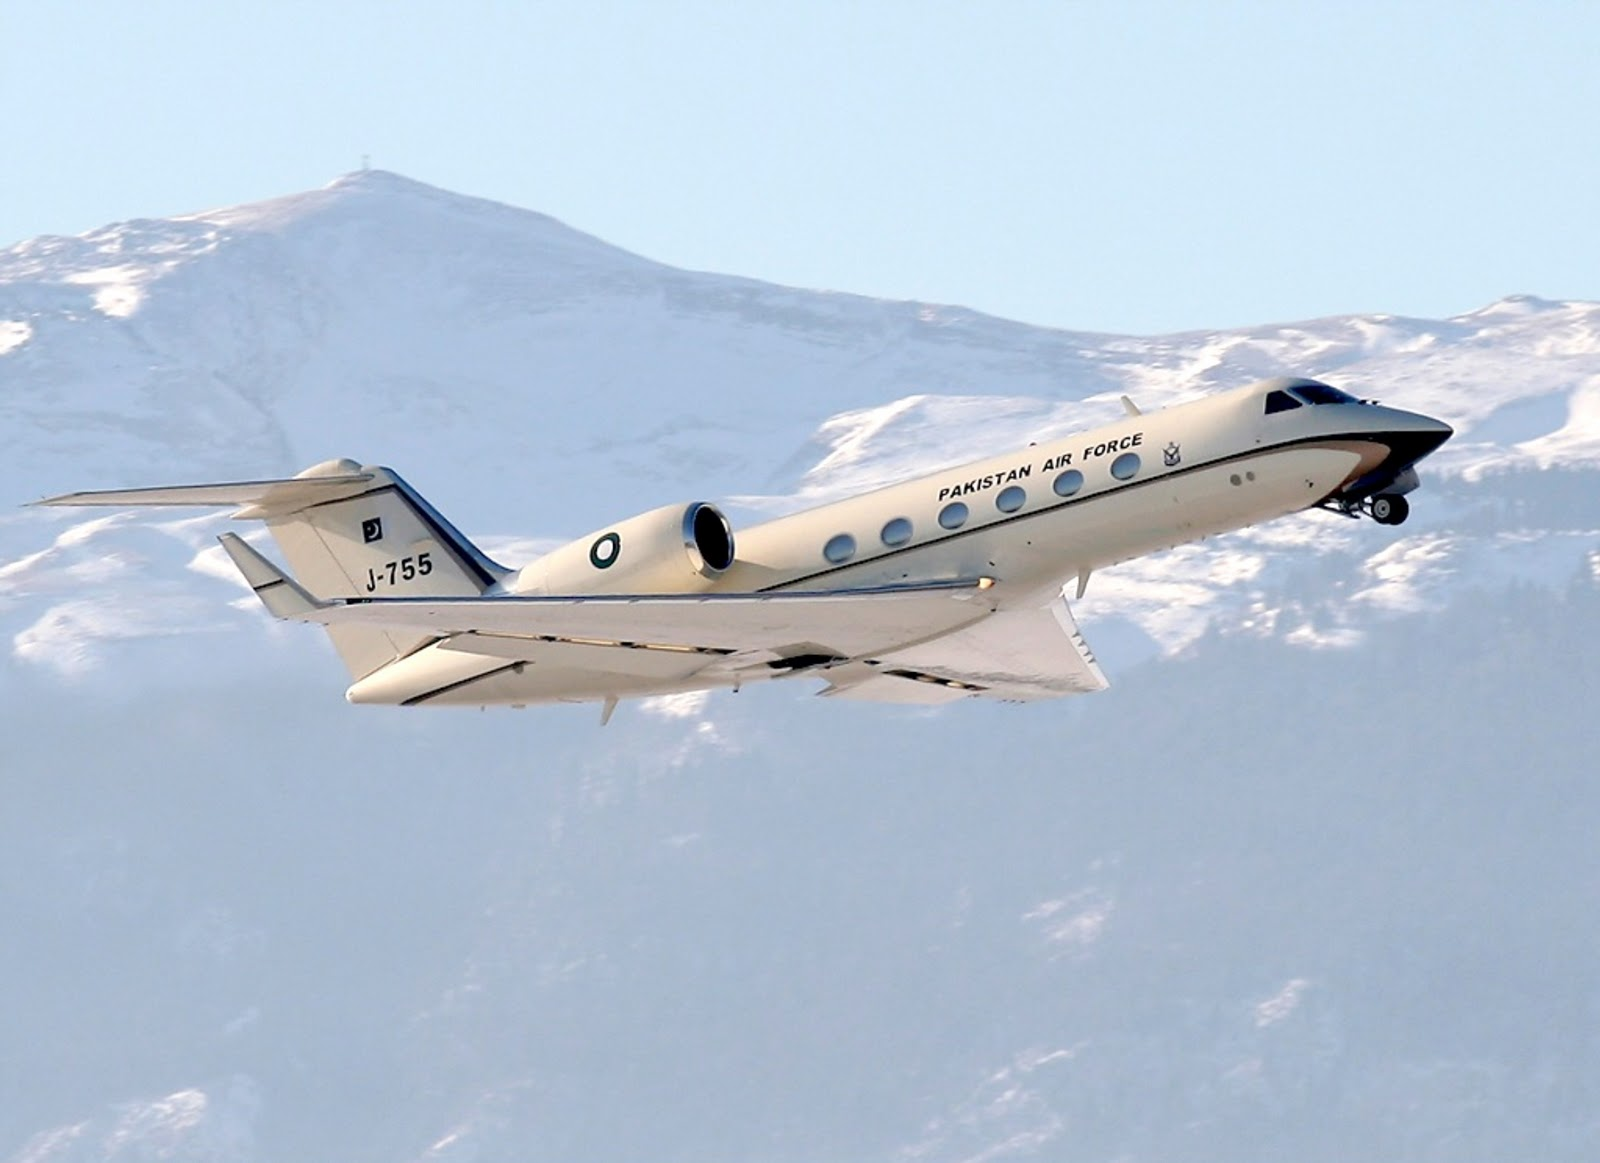 http://1.bp.blogspot.com/-udvSmpvXgVQ/TuiiY-KcjpI/AAAAAAAAHE0/PlZcRKDORYQ/s1600/dassault_falcon_20f_pakistan.jpg